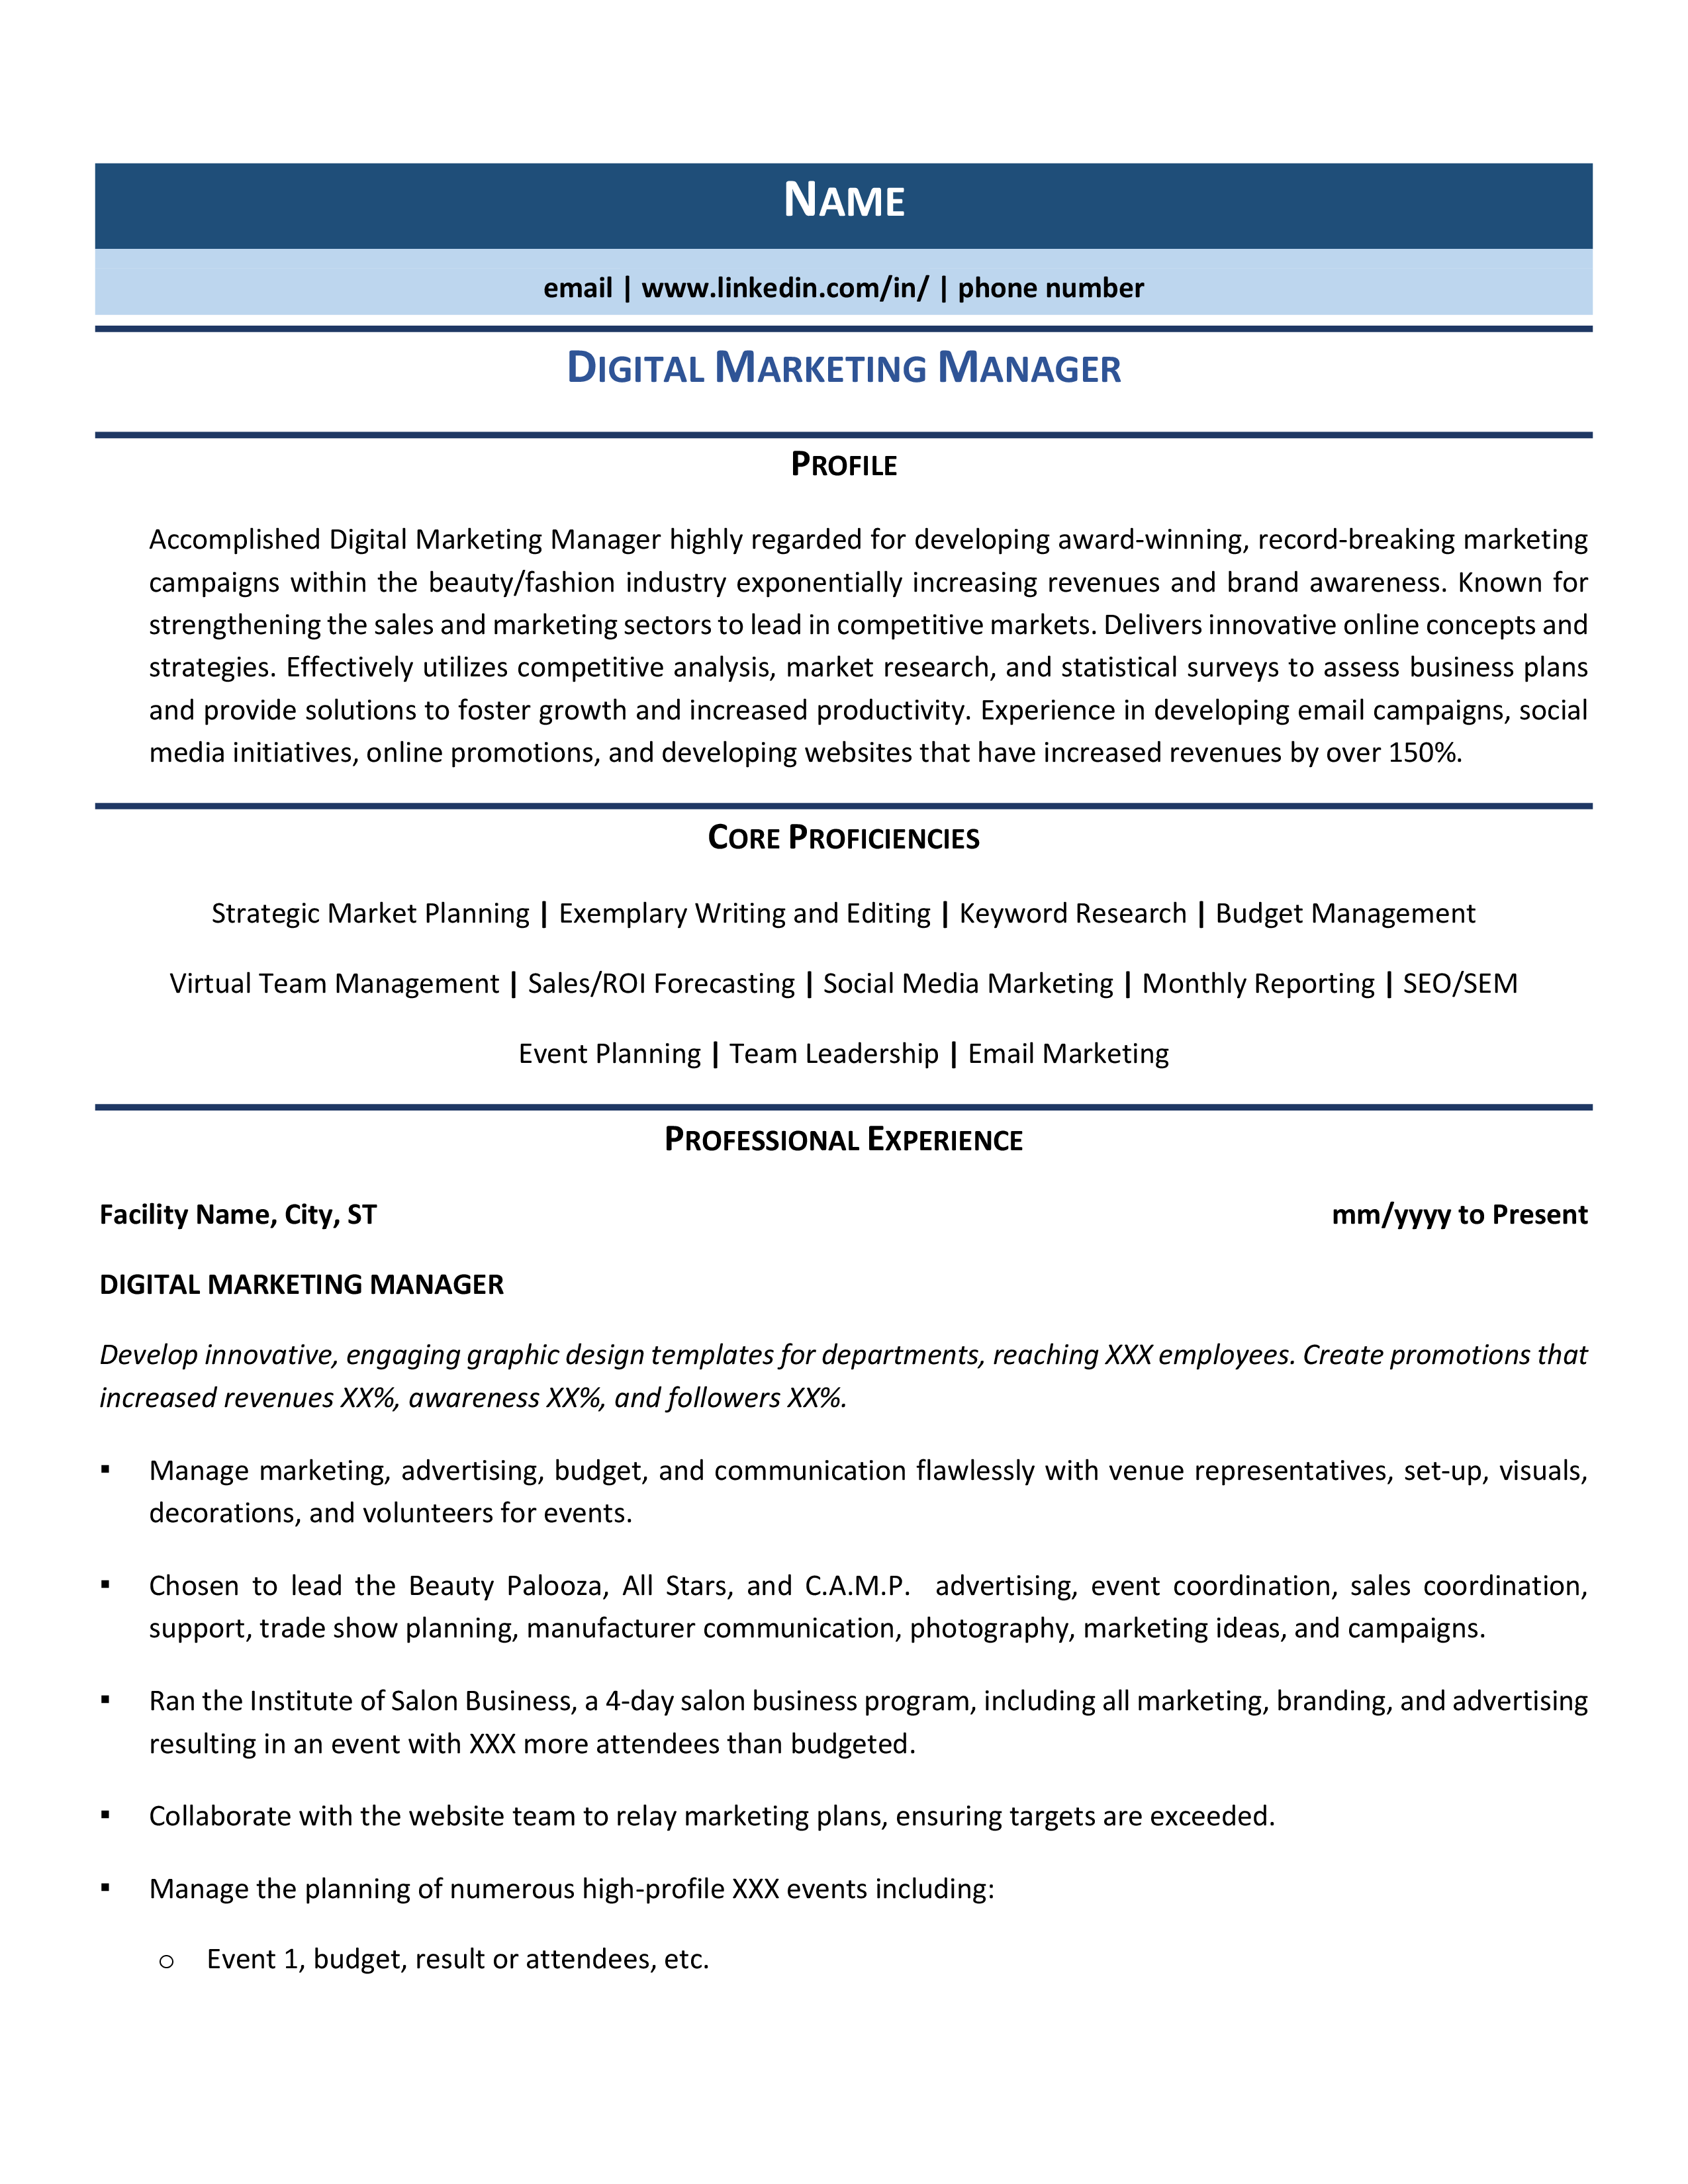 Digital marketing manager resume summary sample. Digital Marketing Manager Resume Samples Template Guide Digital Marketing Manager Digital Marketing Marketing Manager